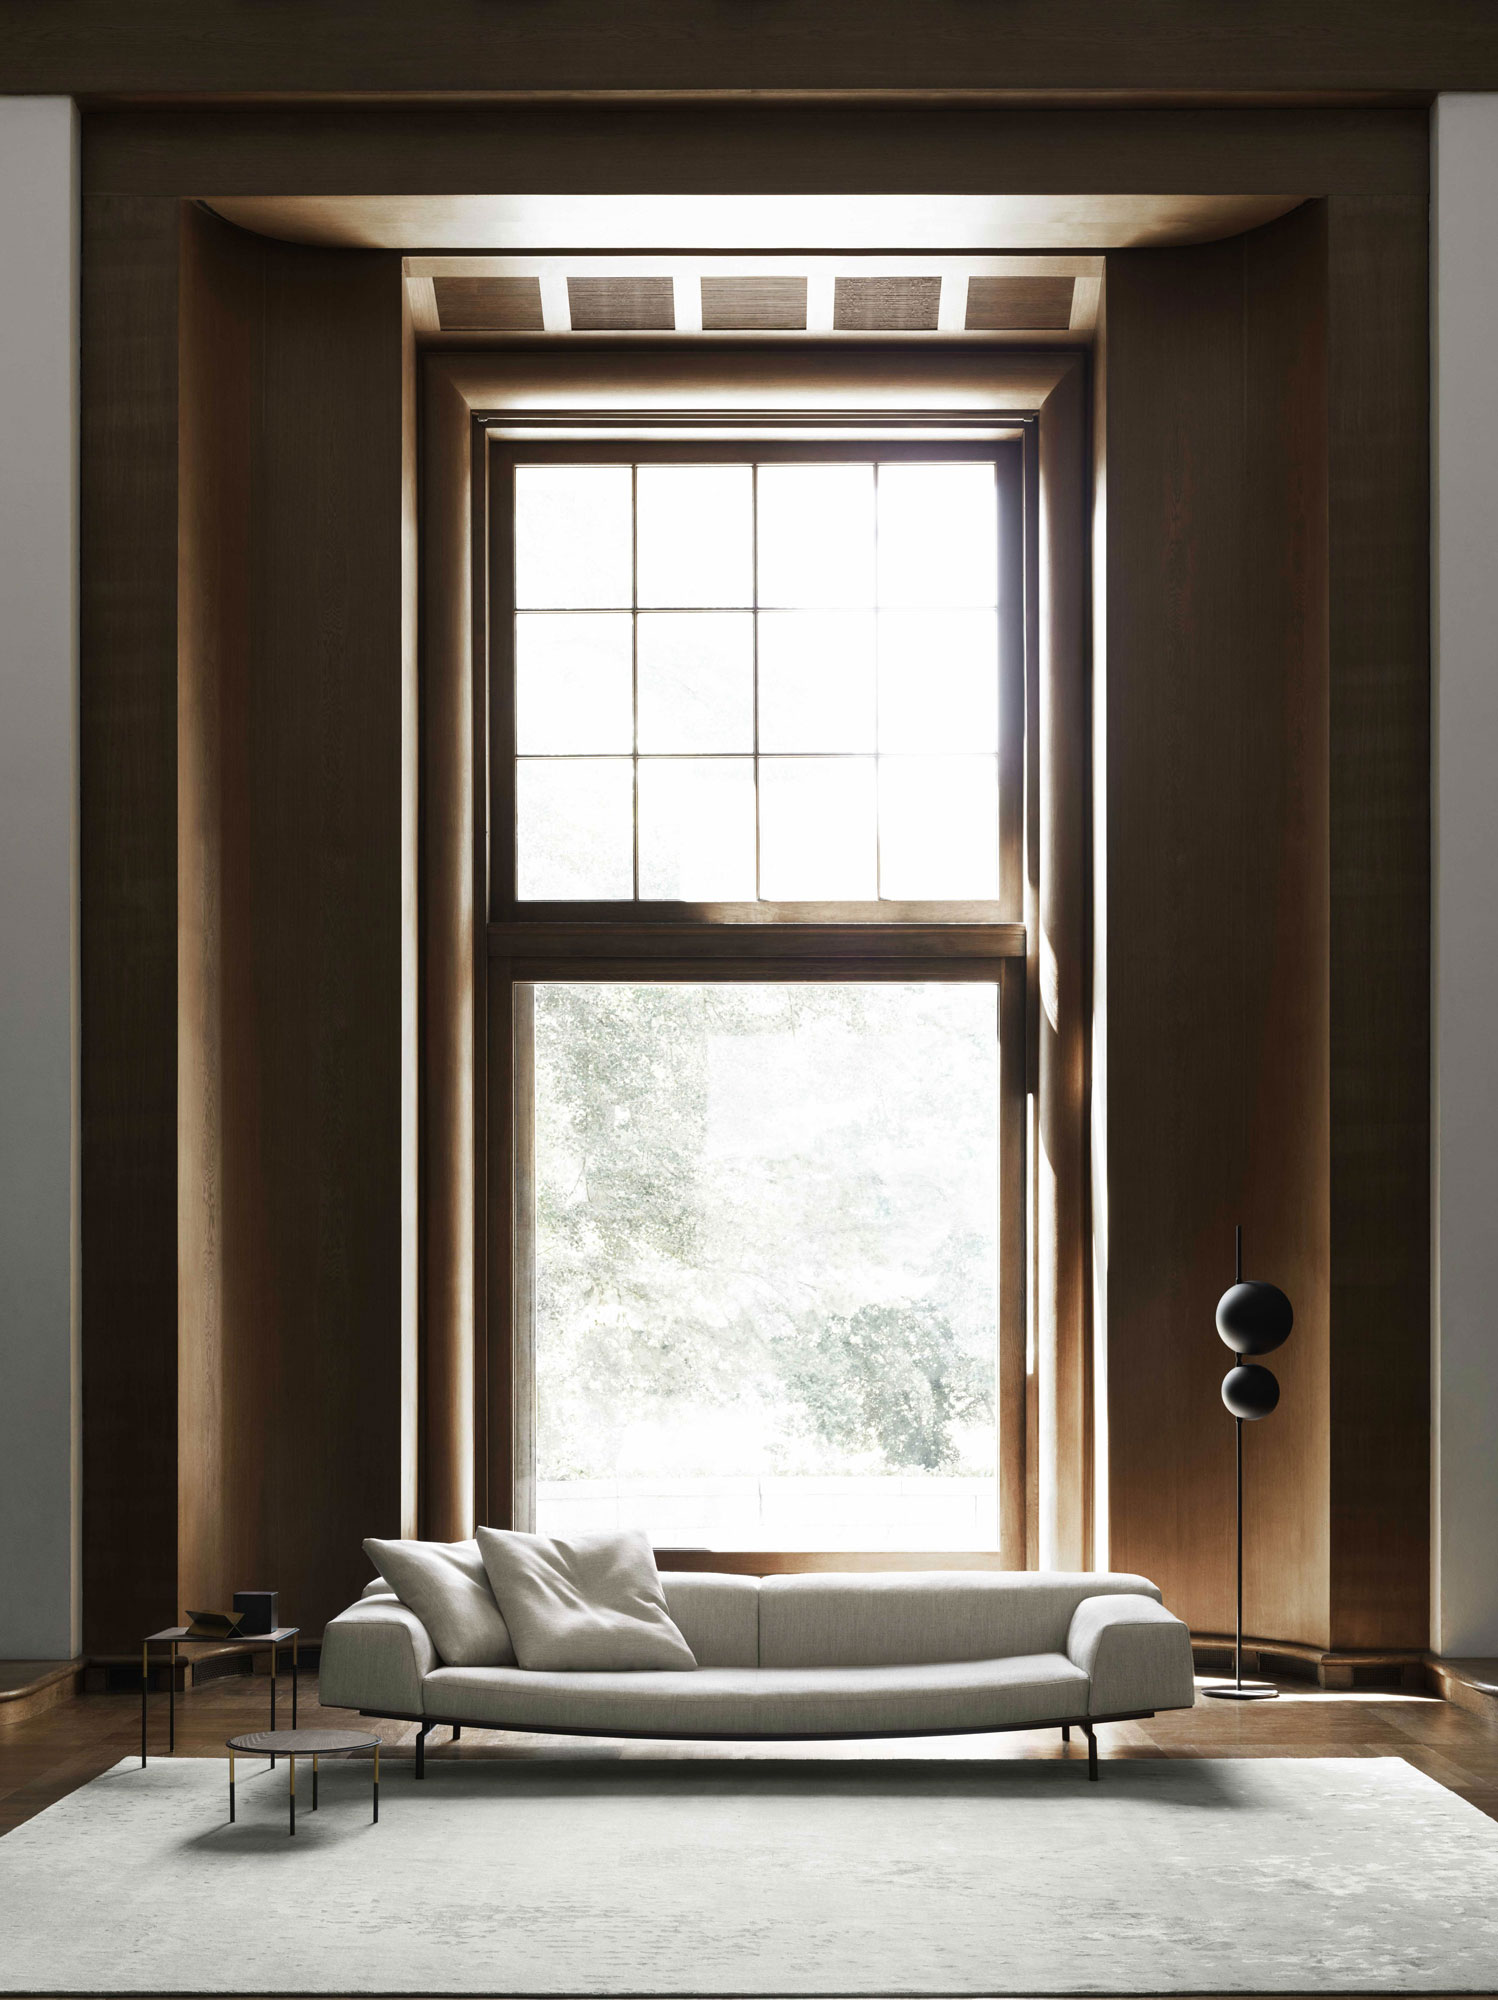 Elegant harmonisches Sofa von Piero Lissoni für Living Divani